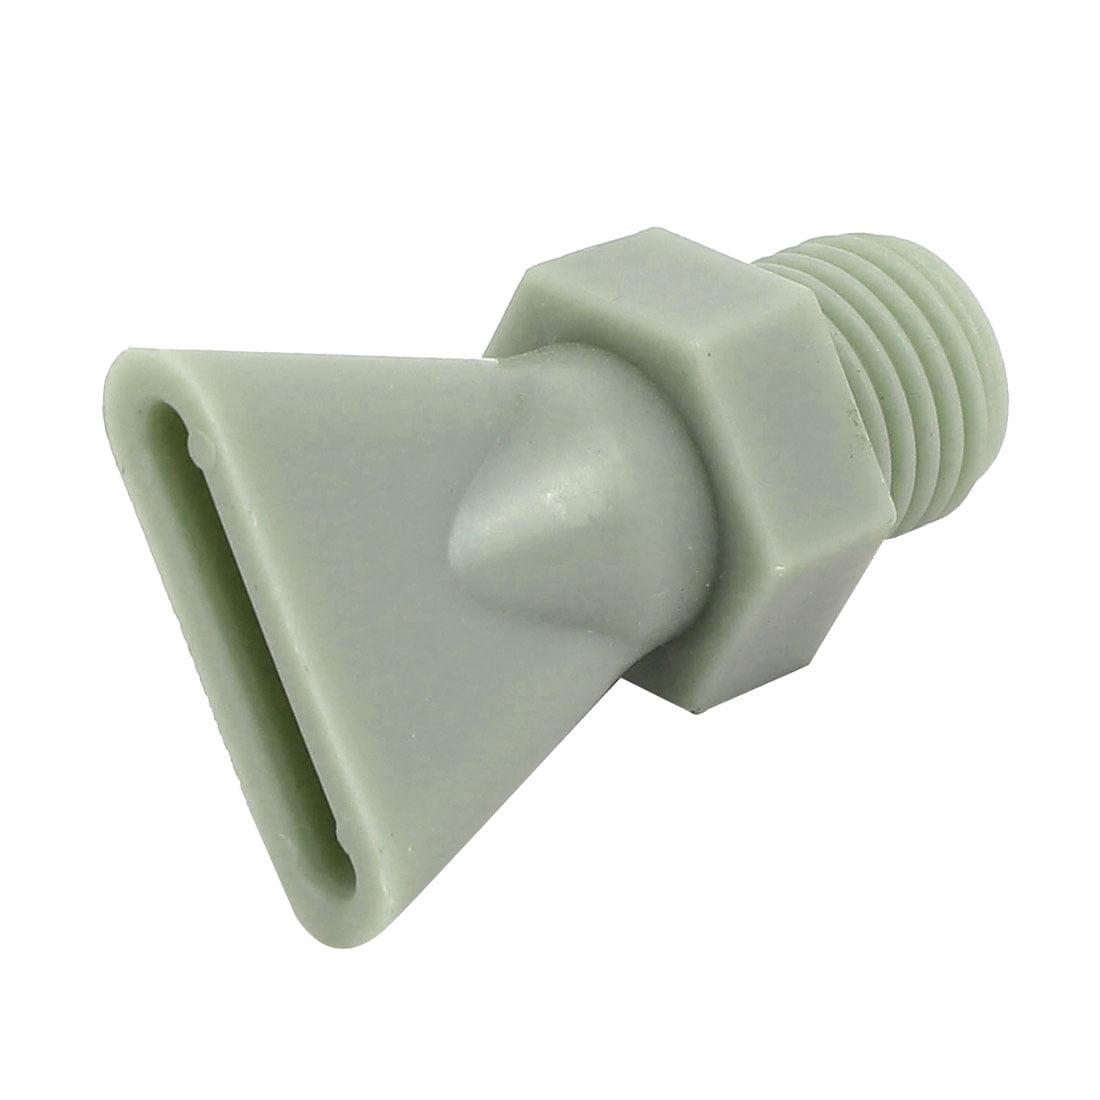 1/4BSP Male Thread Plastic Water Spout Sprayer Flat Jet Nozzle Gray